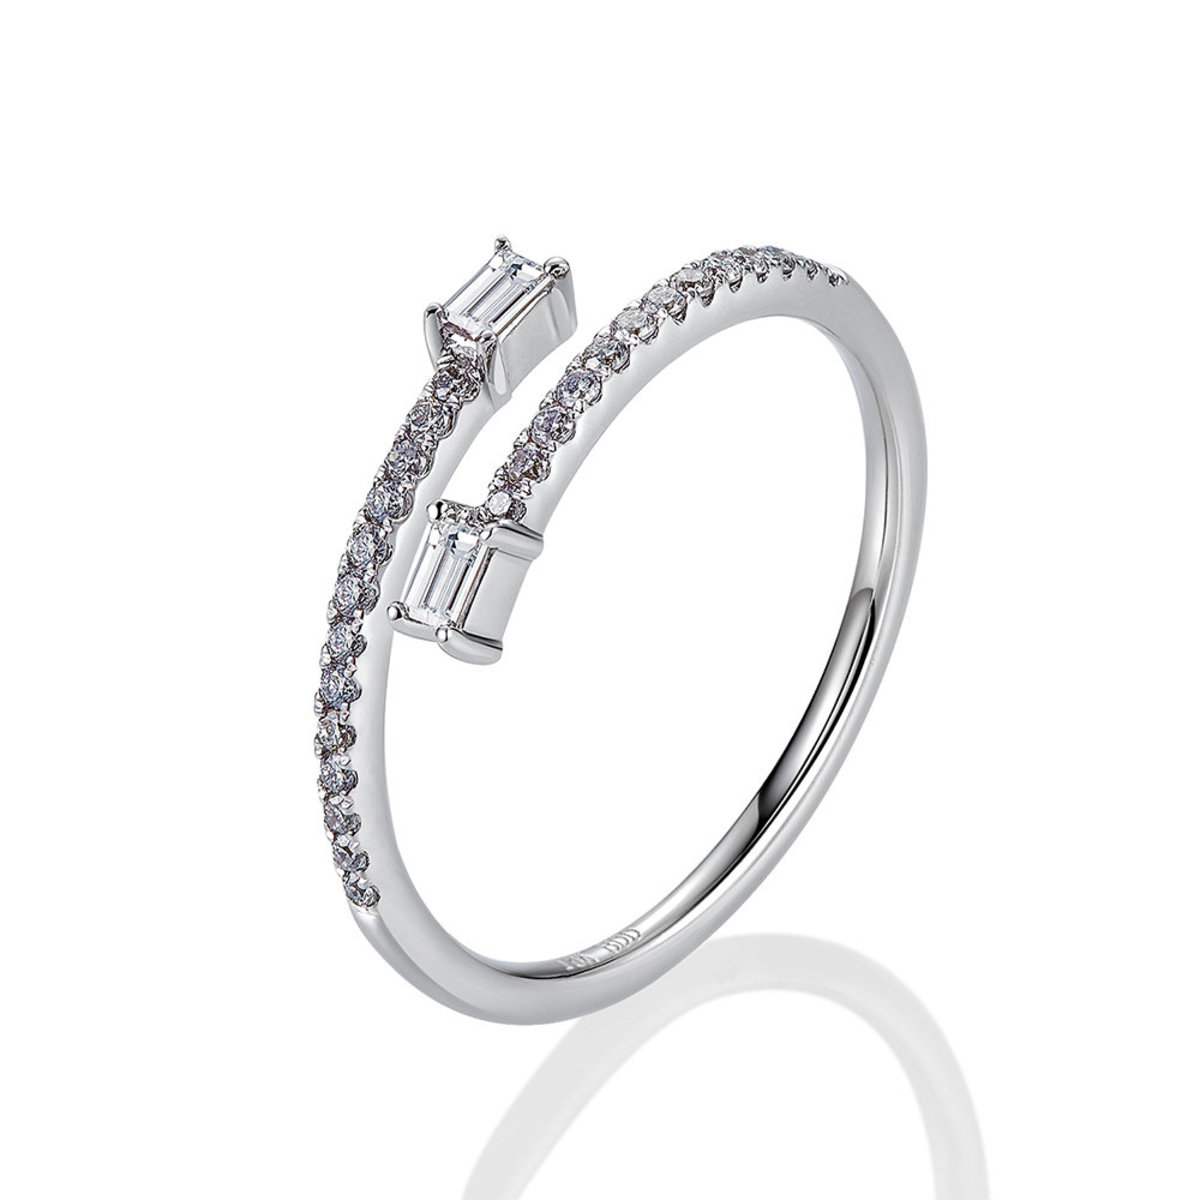 18K White Gold Linear Wrap Diamond Ring (0.23 ct. tw.)